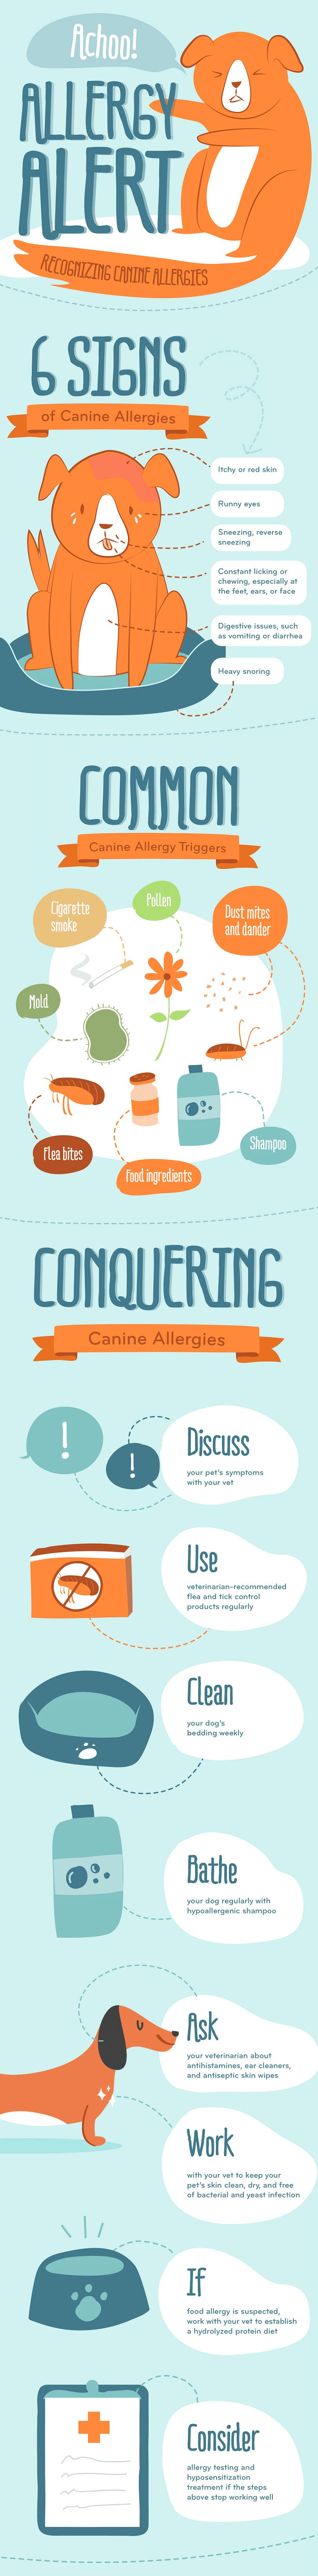 How to diagnoze dog eye allergies